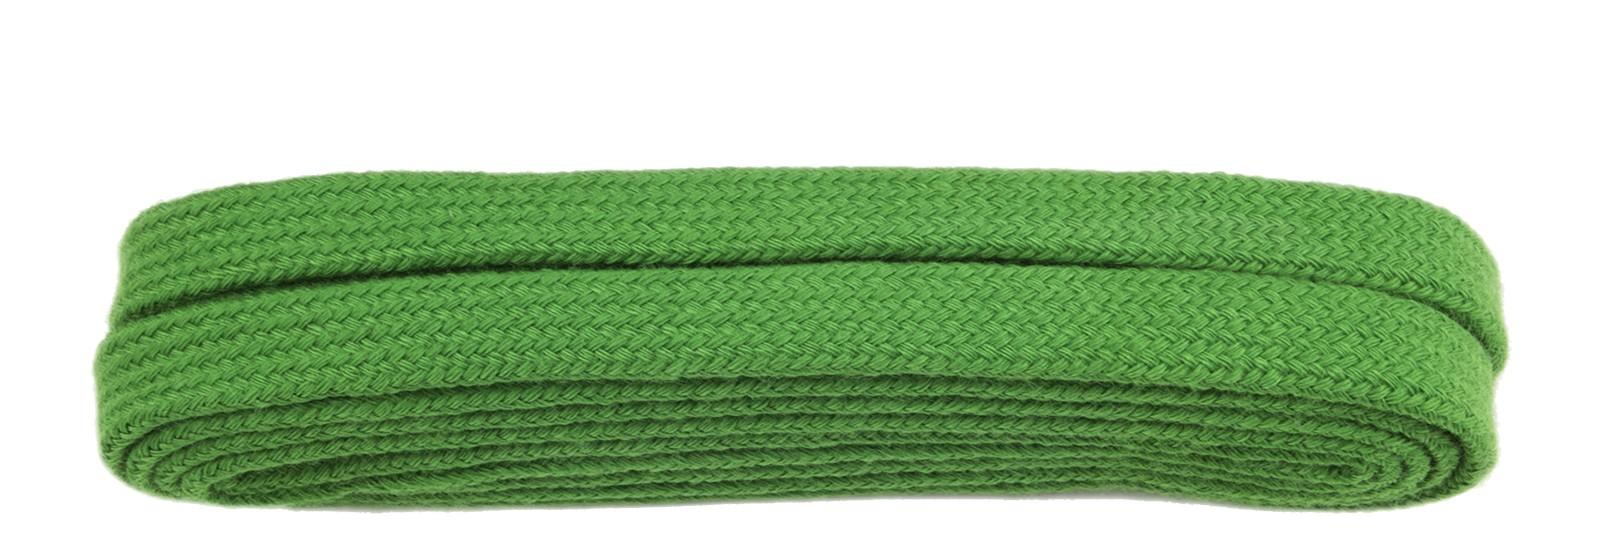 Emerald Green Flat 9mm 100cm